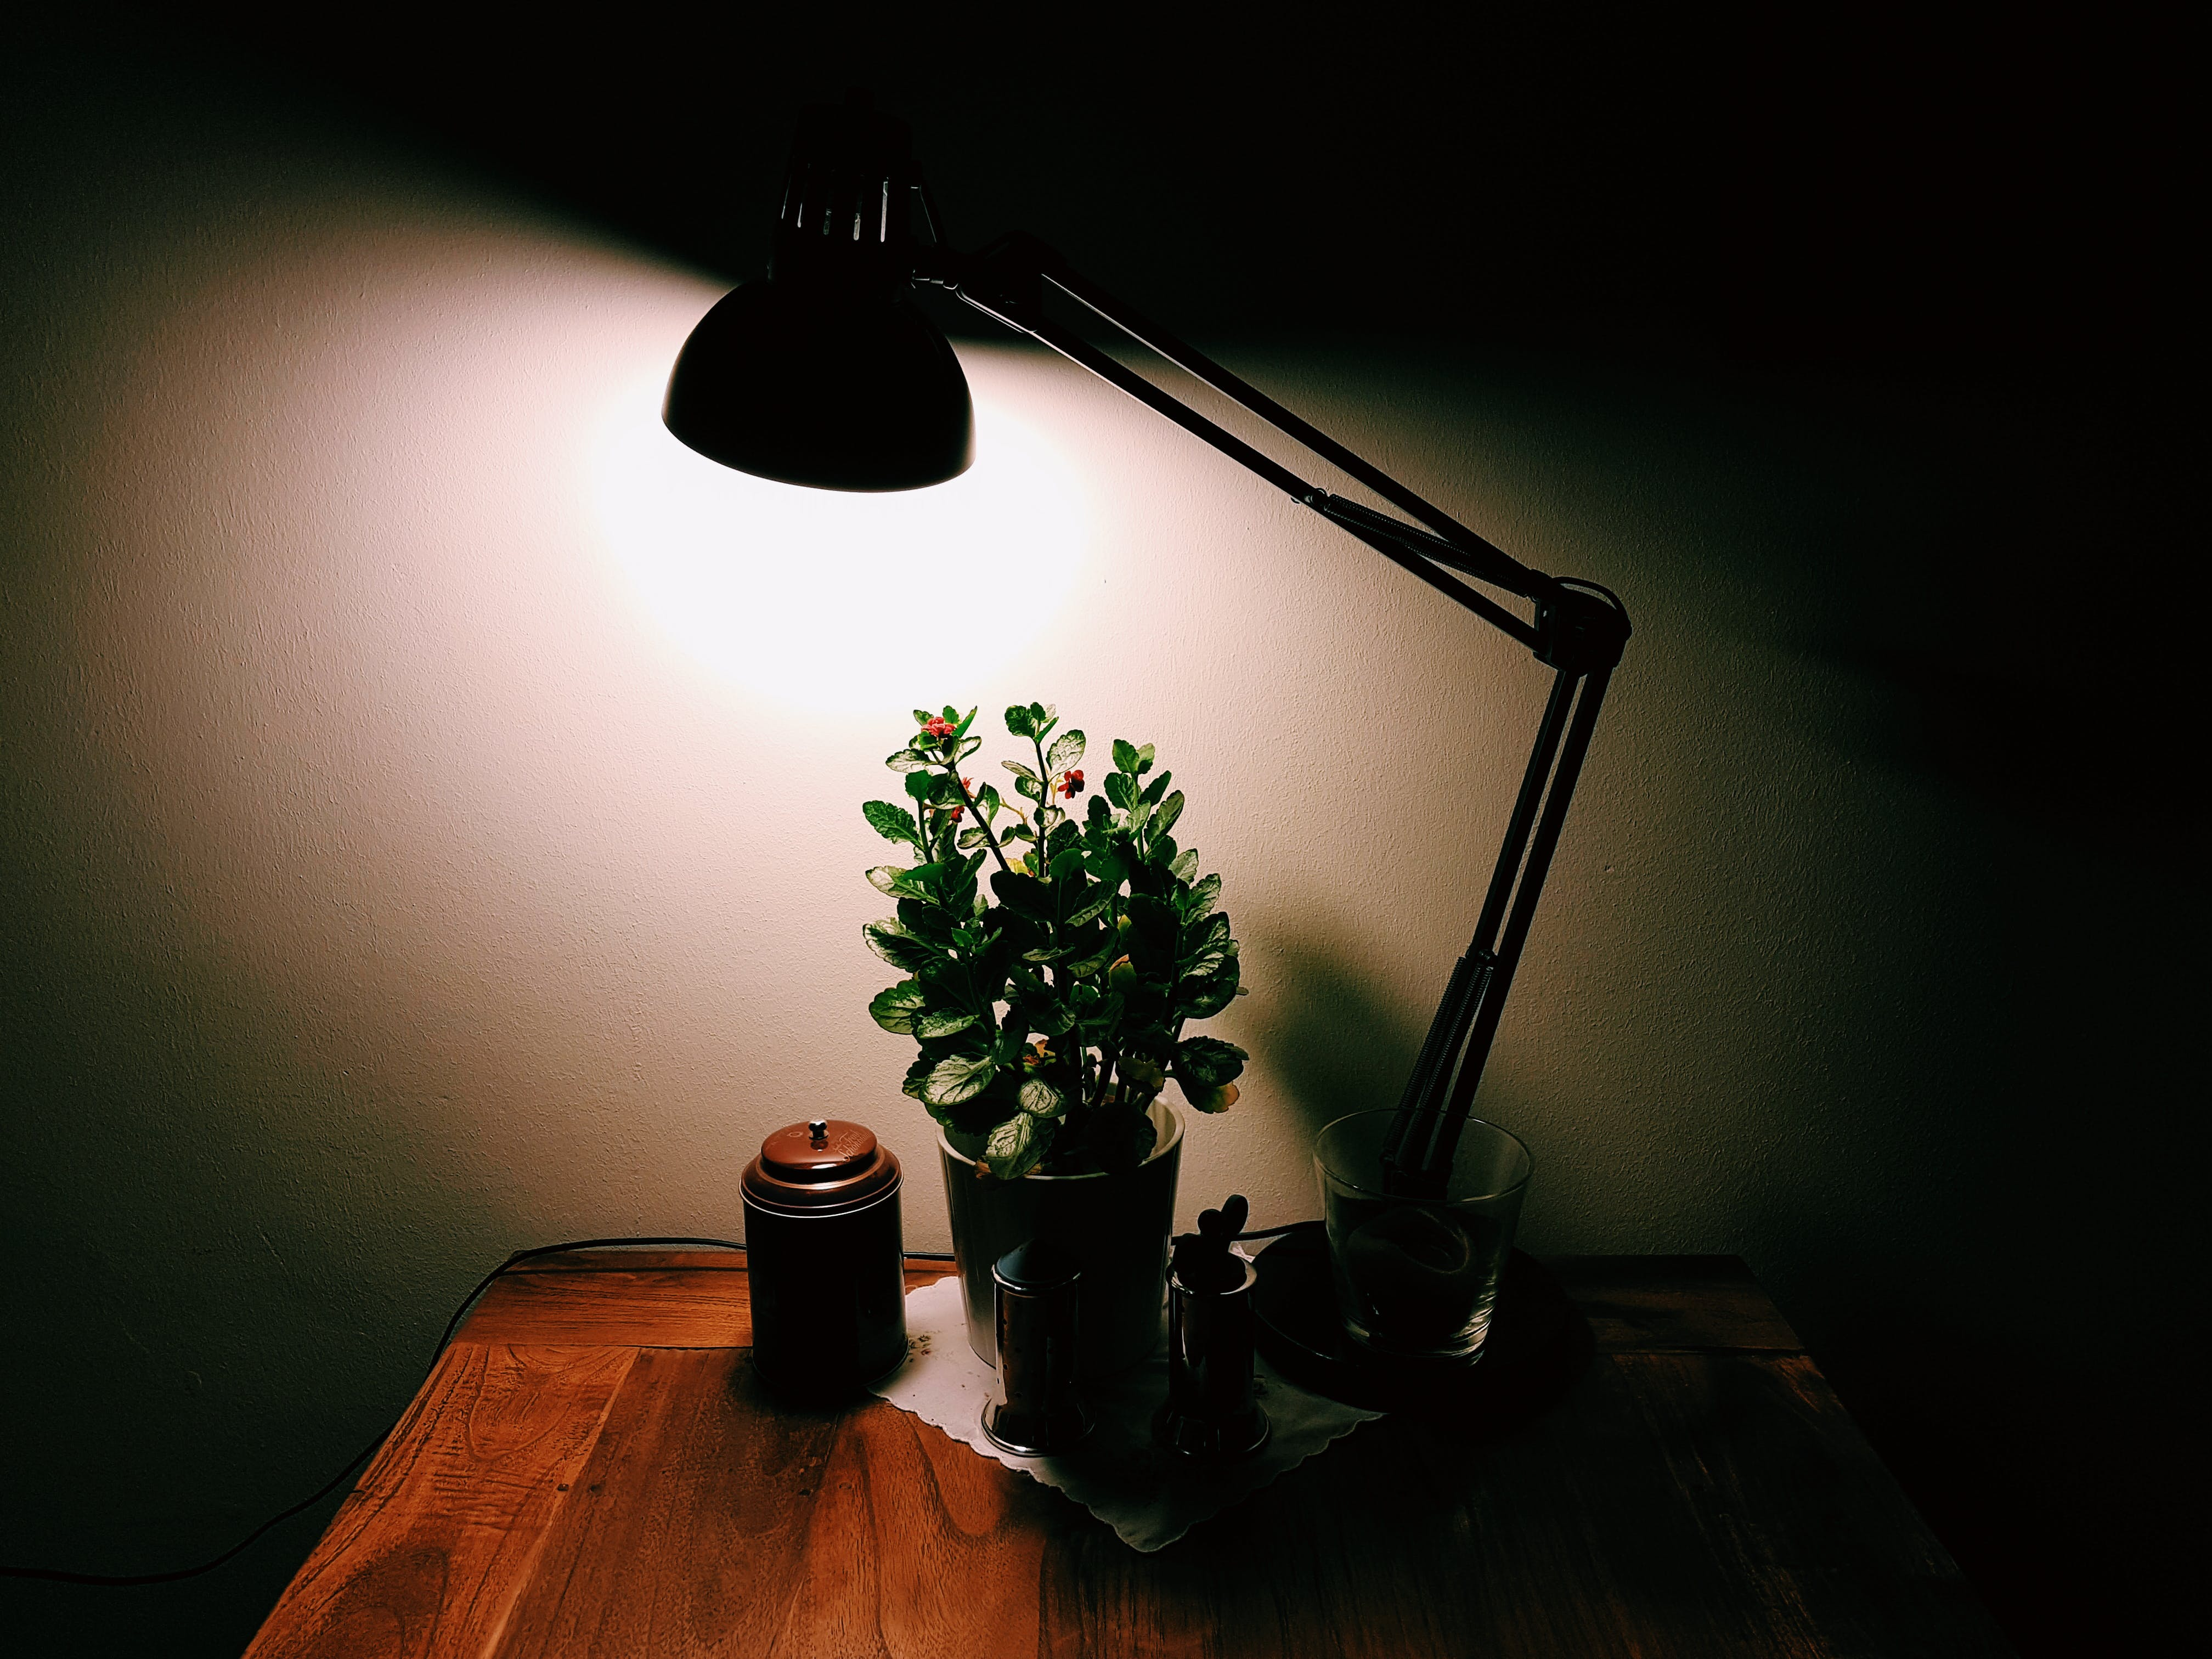 backlit, belonging, cozy